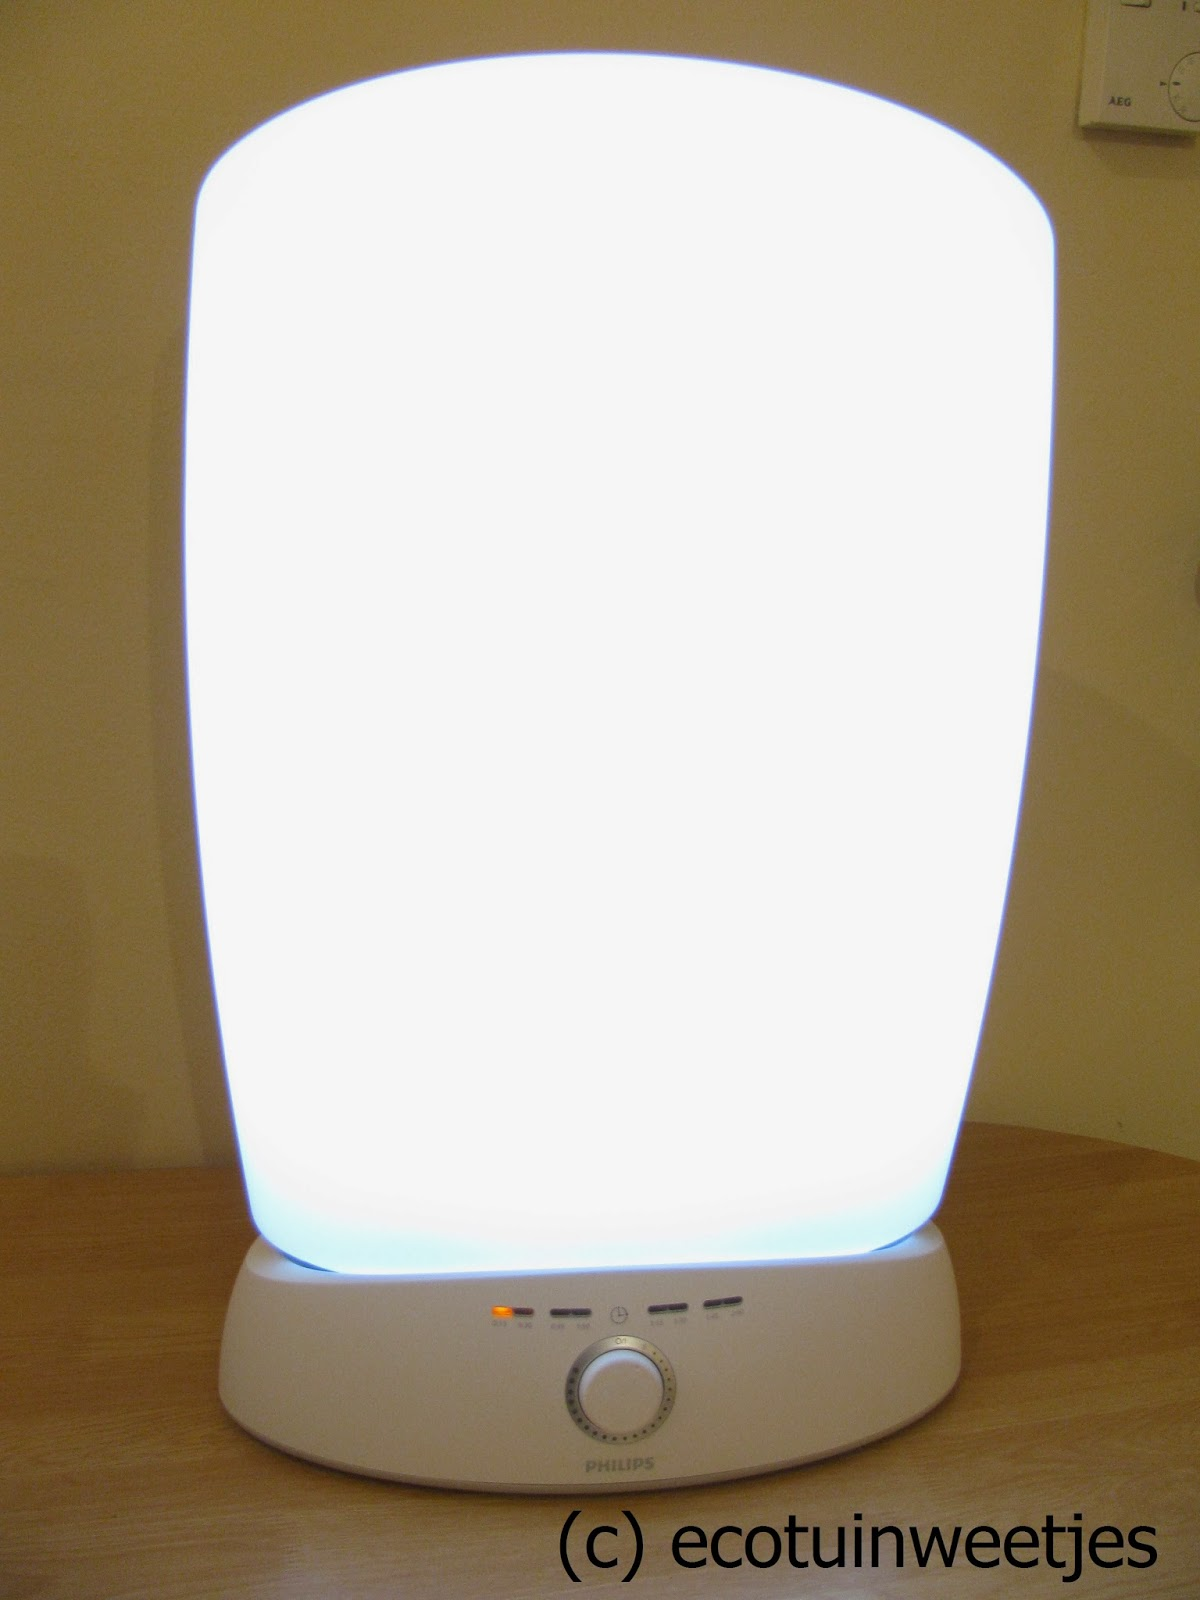 Philips EnergyLight EnergyUp lichttherapie Wake-Up light